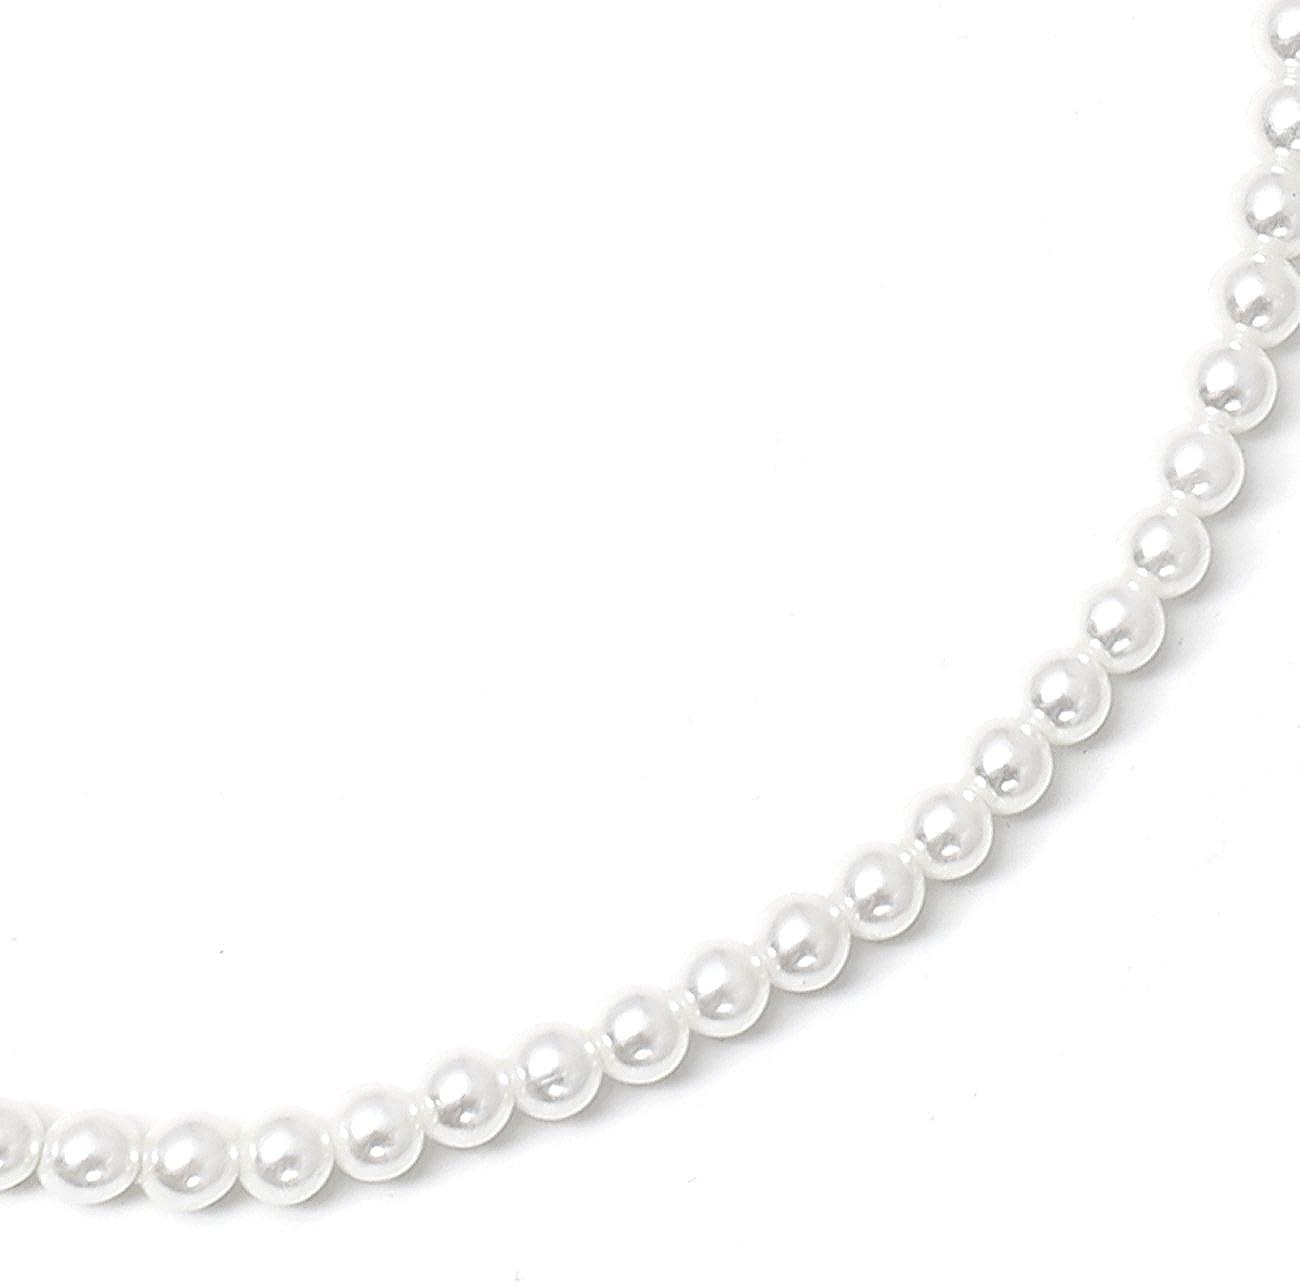 Topwholesalejewel White Pearl Single Row Strand Necklace